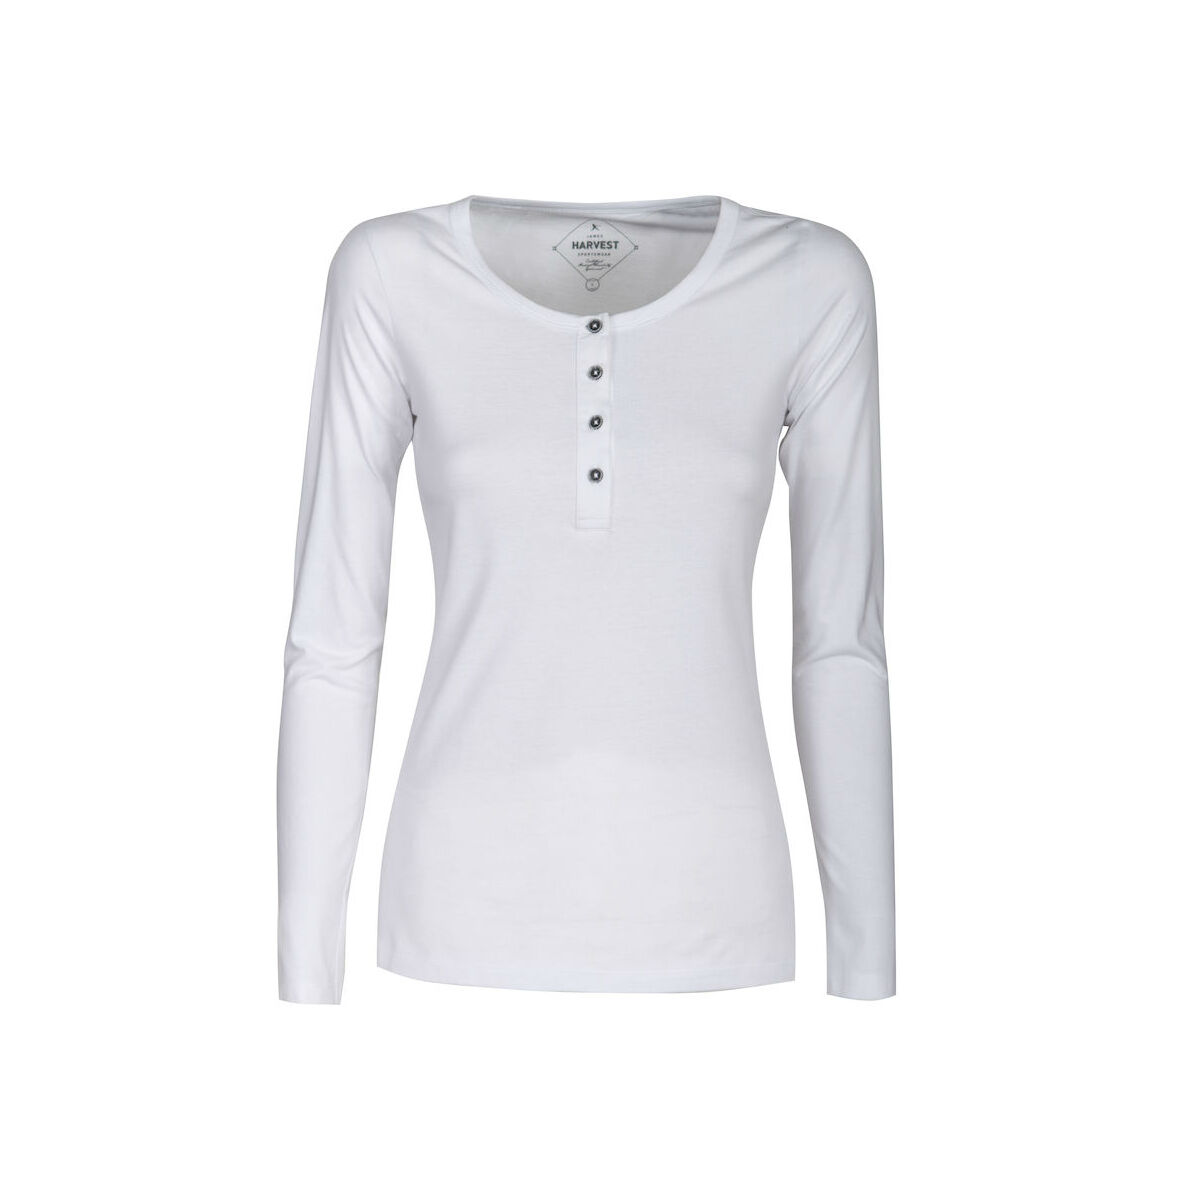 Harvest Long Sleeved Sweater (Ladies White)